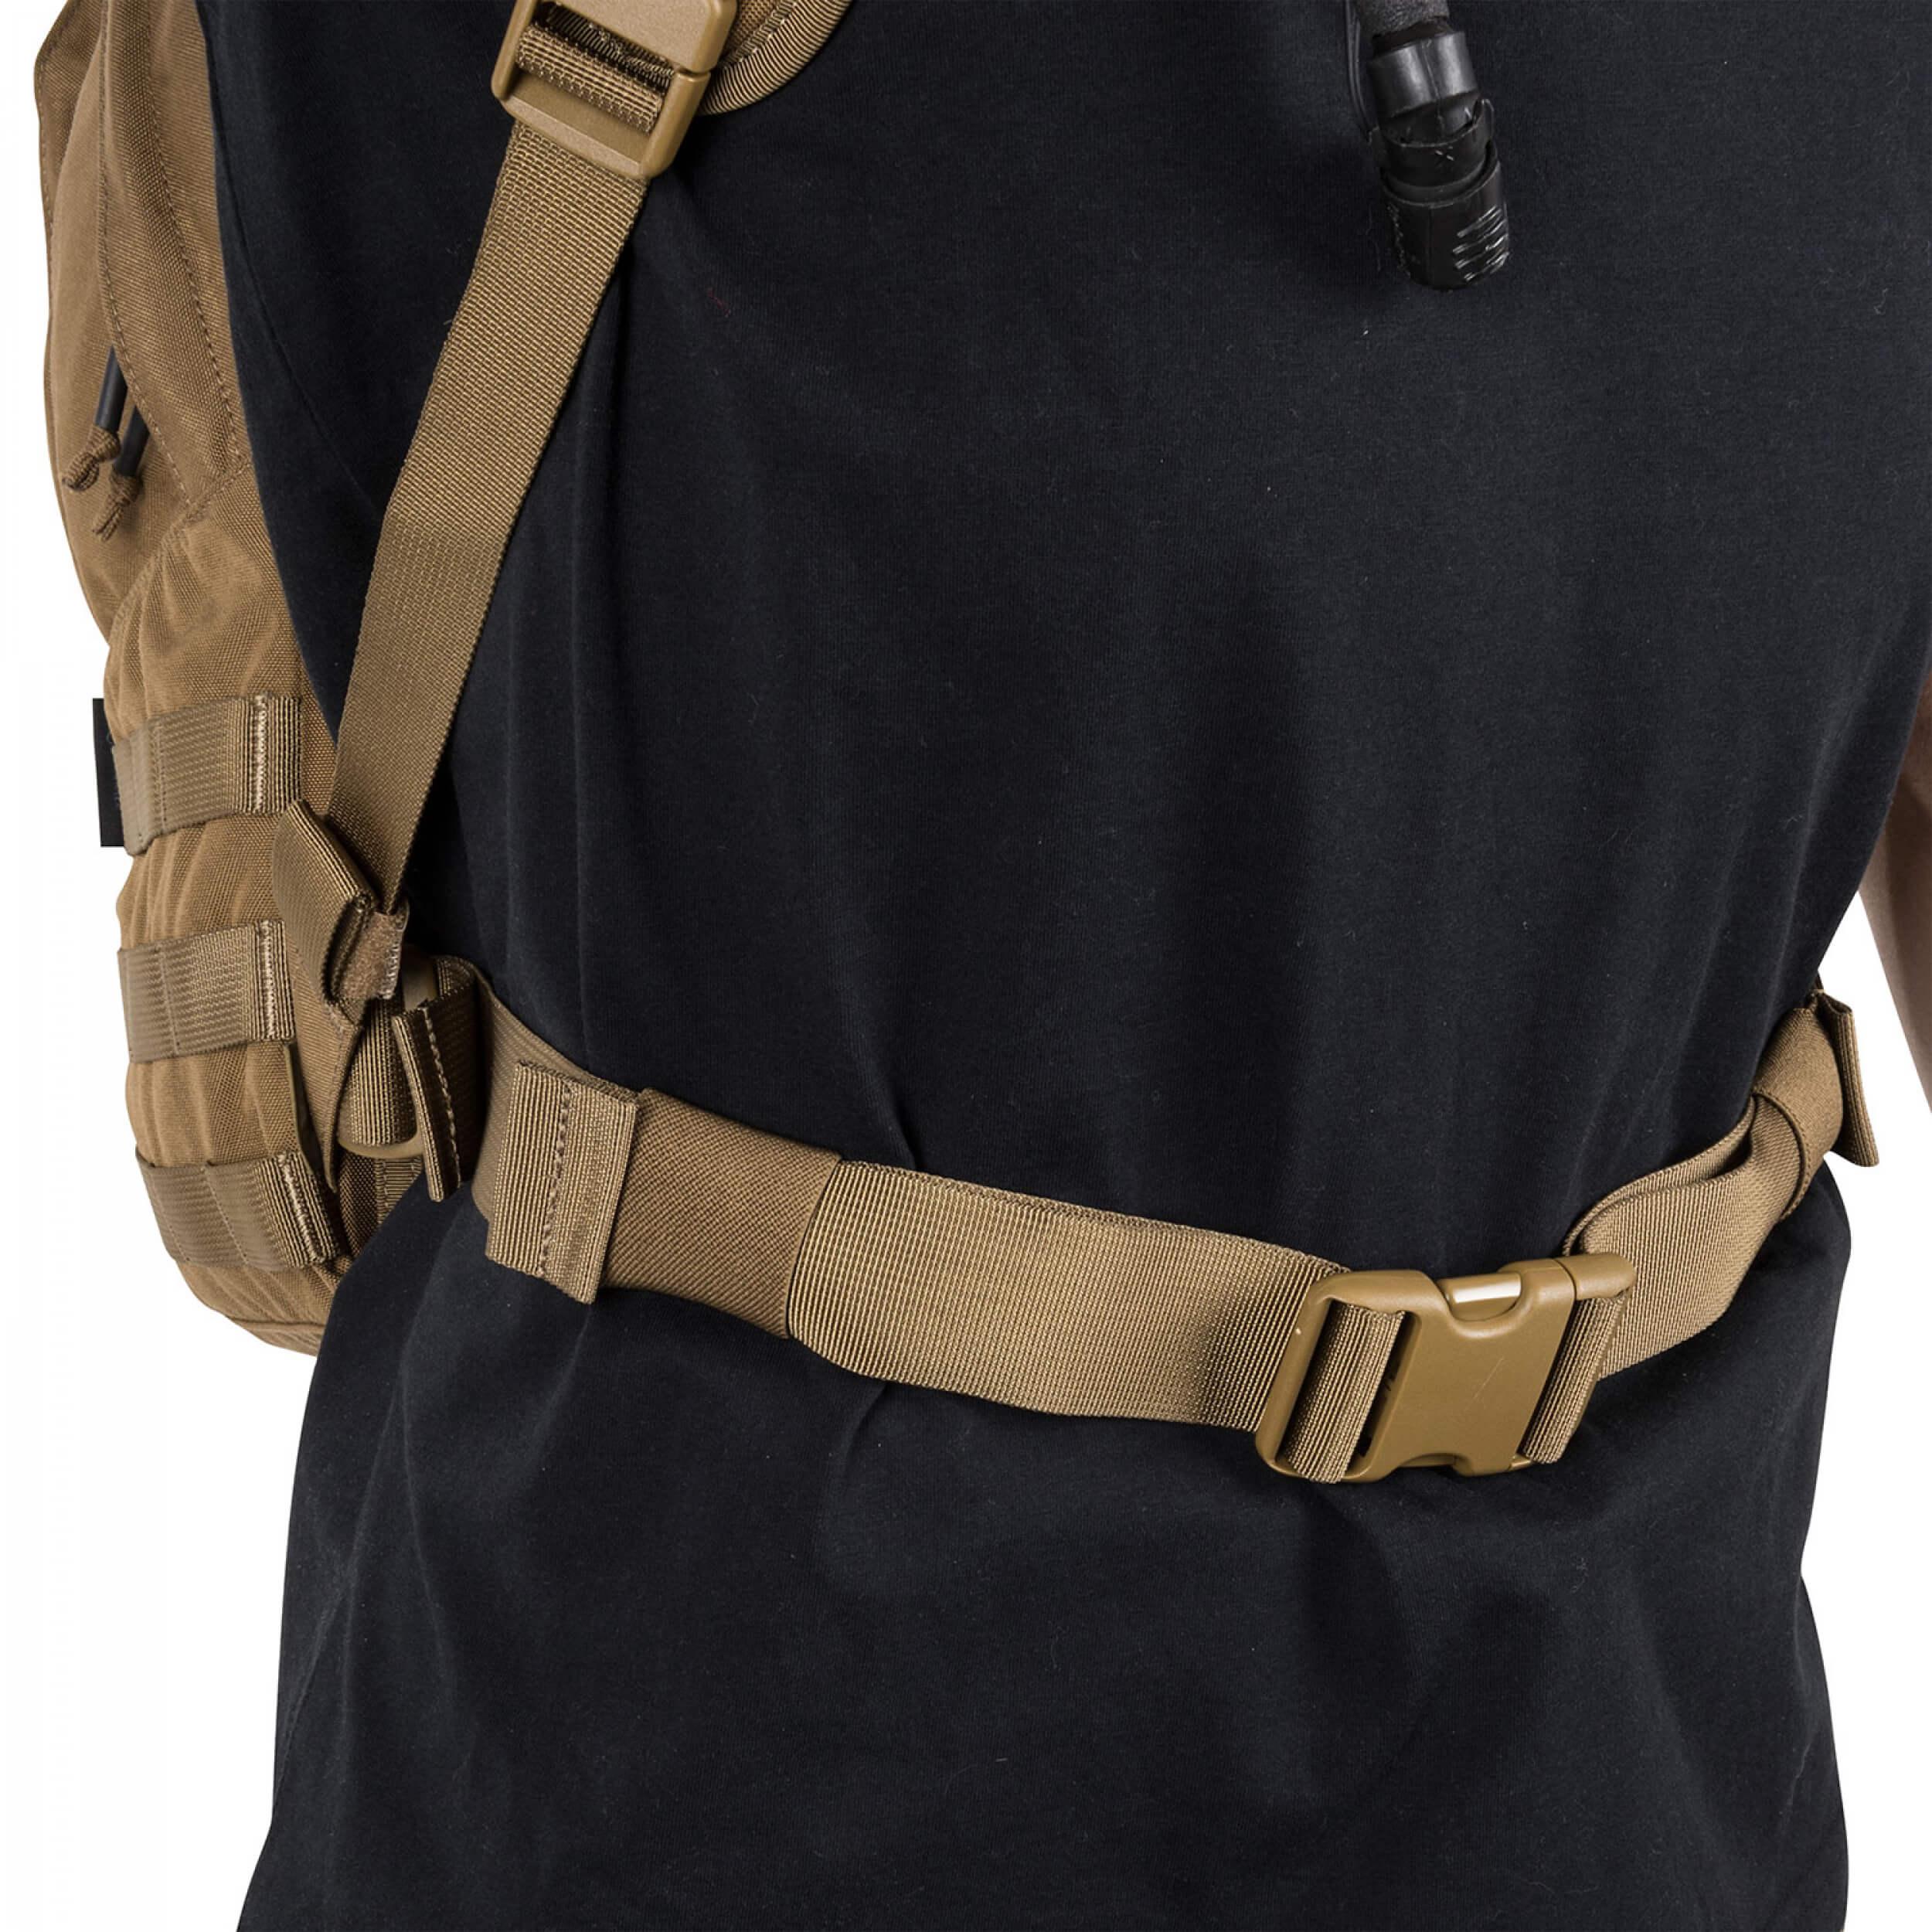 Helikon-Tex EDC Pack -Cordura- Multicam